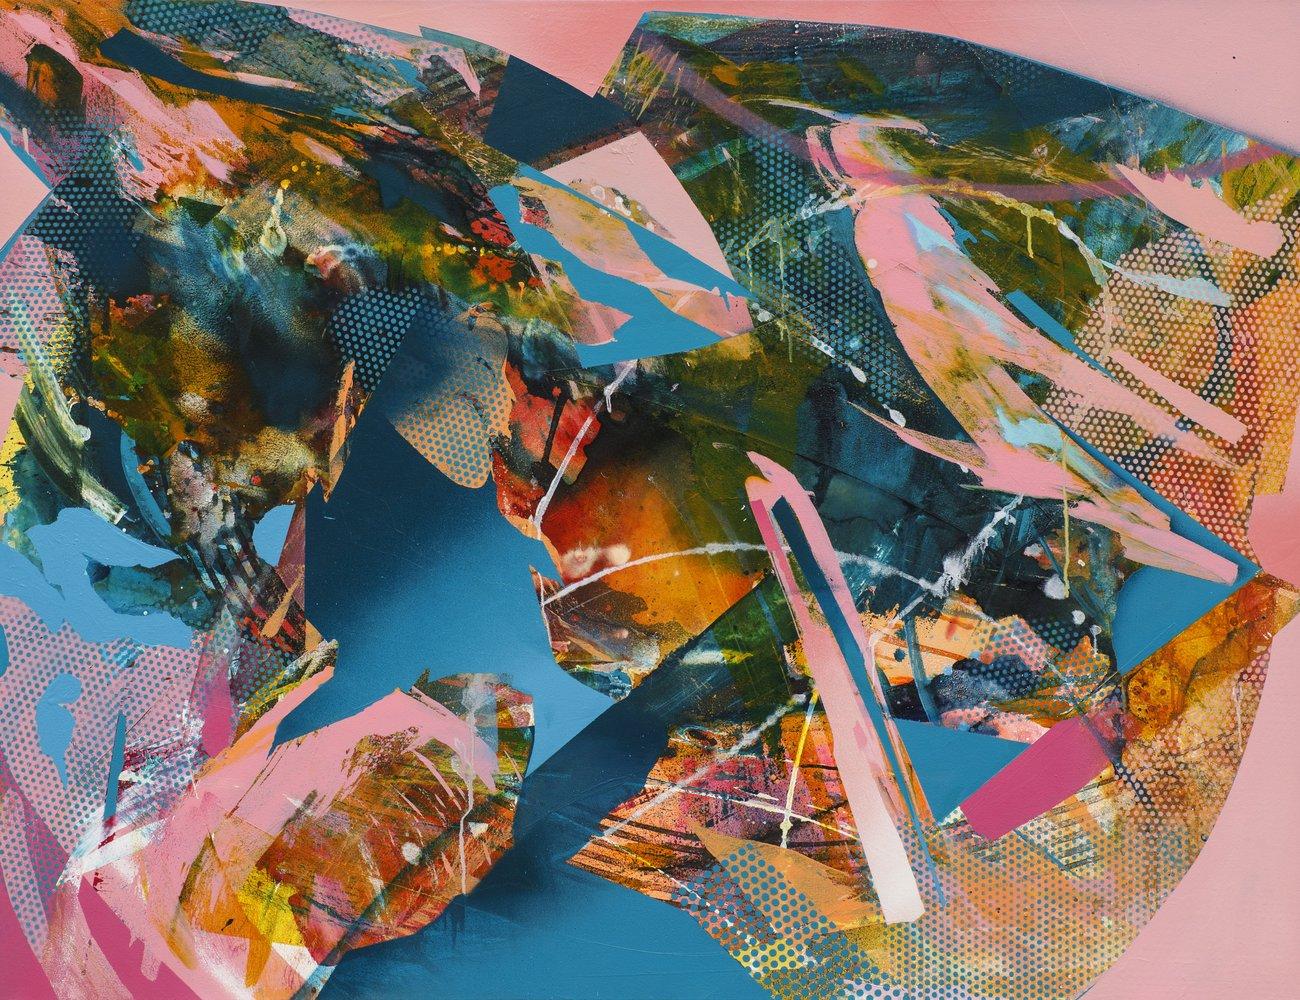 Julia Benz | Pleasure, acrylic, ink, spraypaint on canvas, 100 x 130 cm, 2021